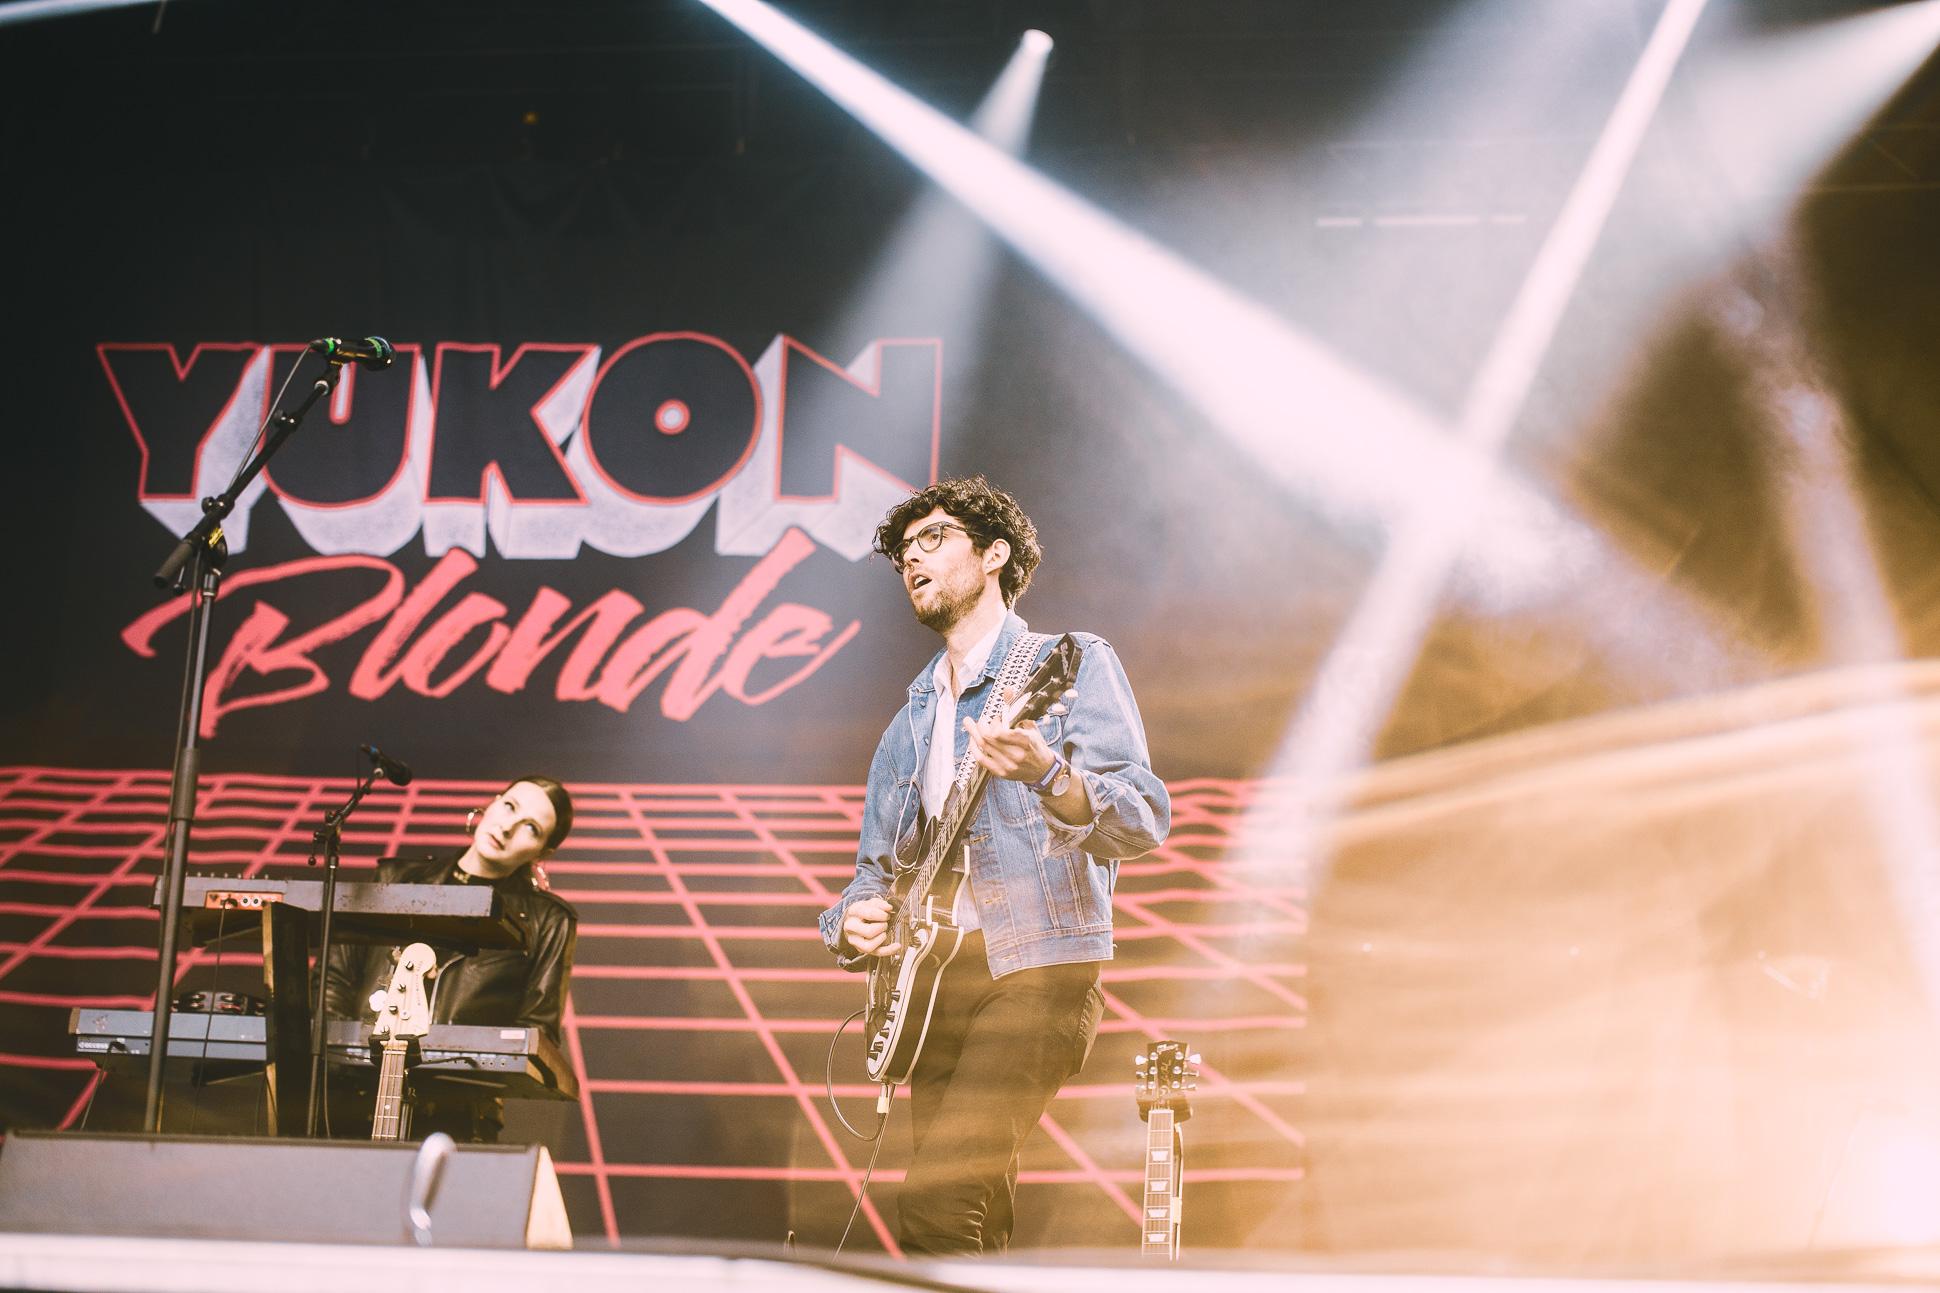 3YukonBlonde-StanleyPark-09-09-2018-Skookum-02.jpg